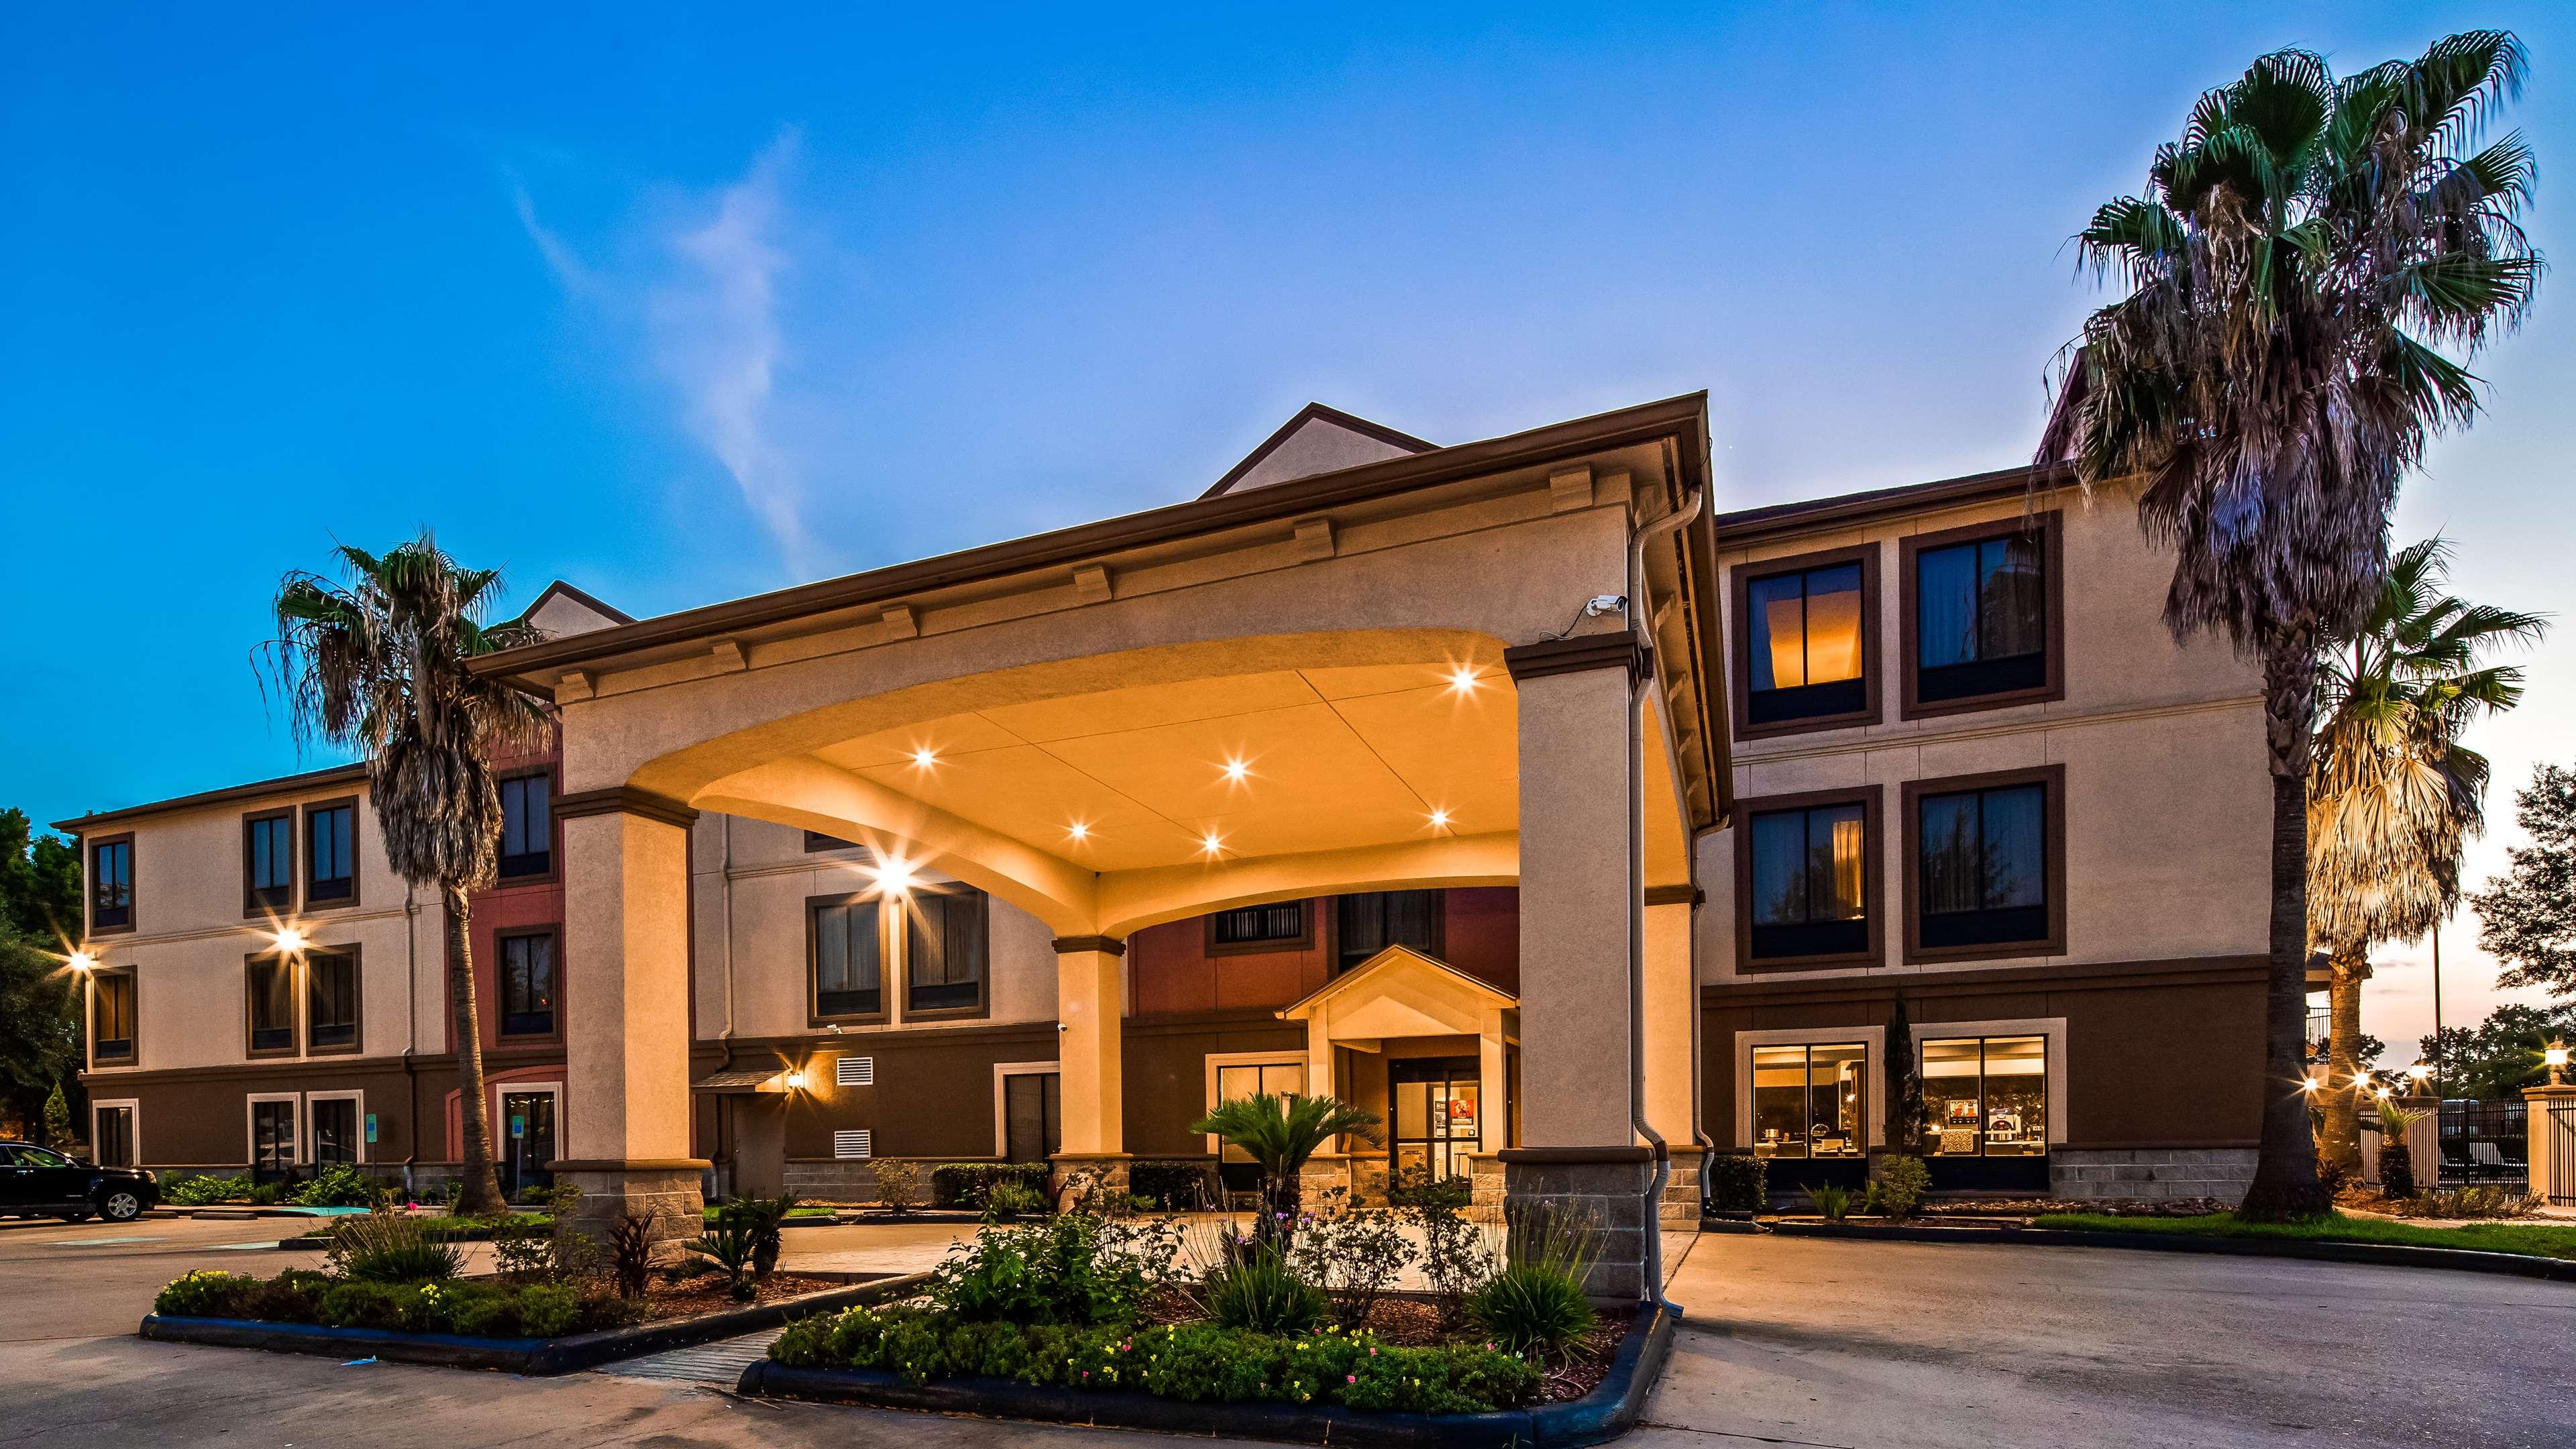 Best Western Plus North Houston Inn & Suites image 1